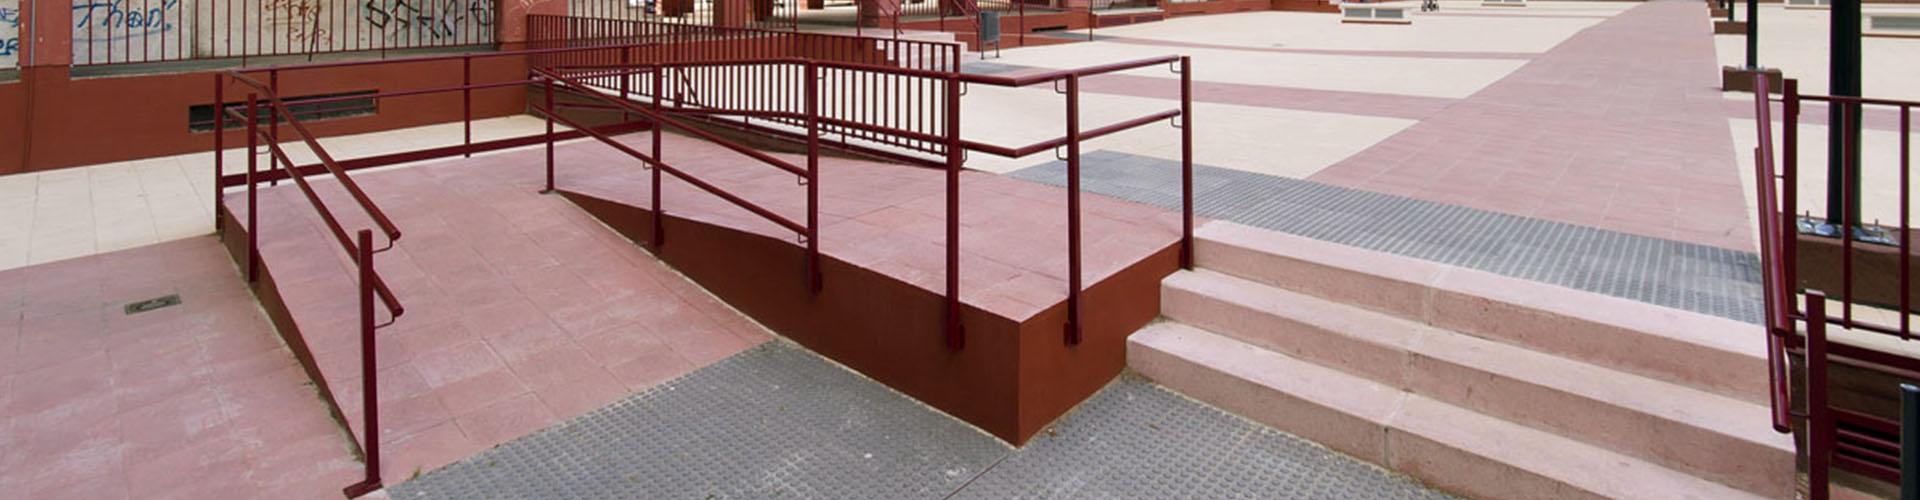 rehabilitacion-espacios-comunes-urbanizacion-San-Pio-rampa-Slider